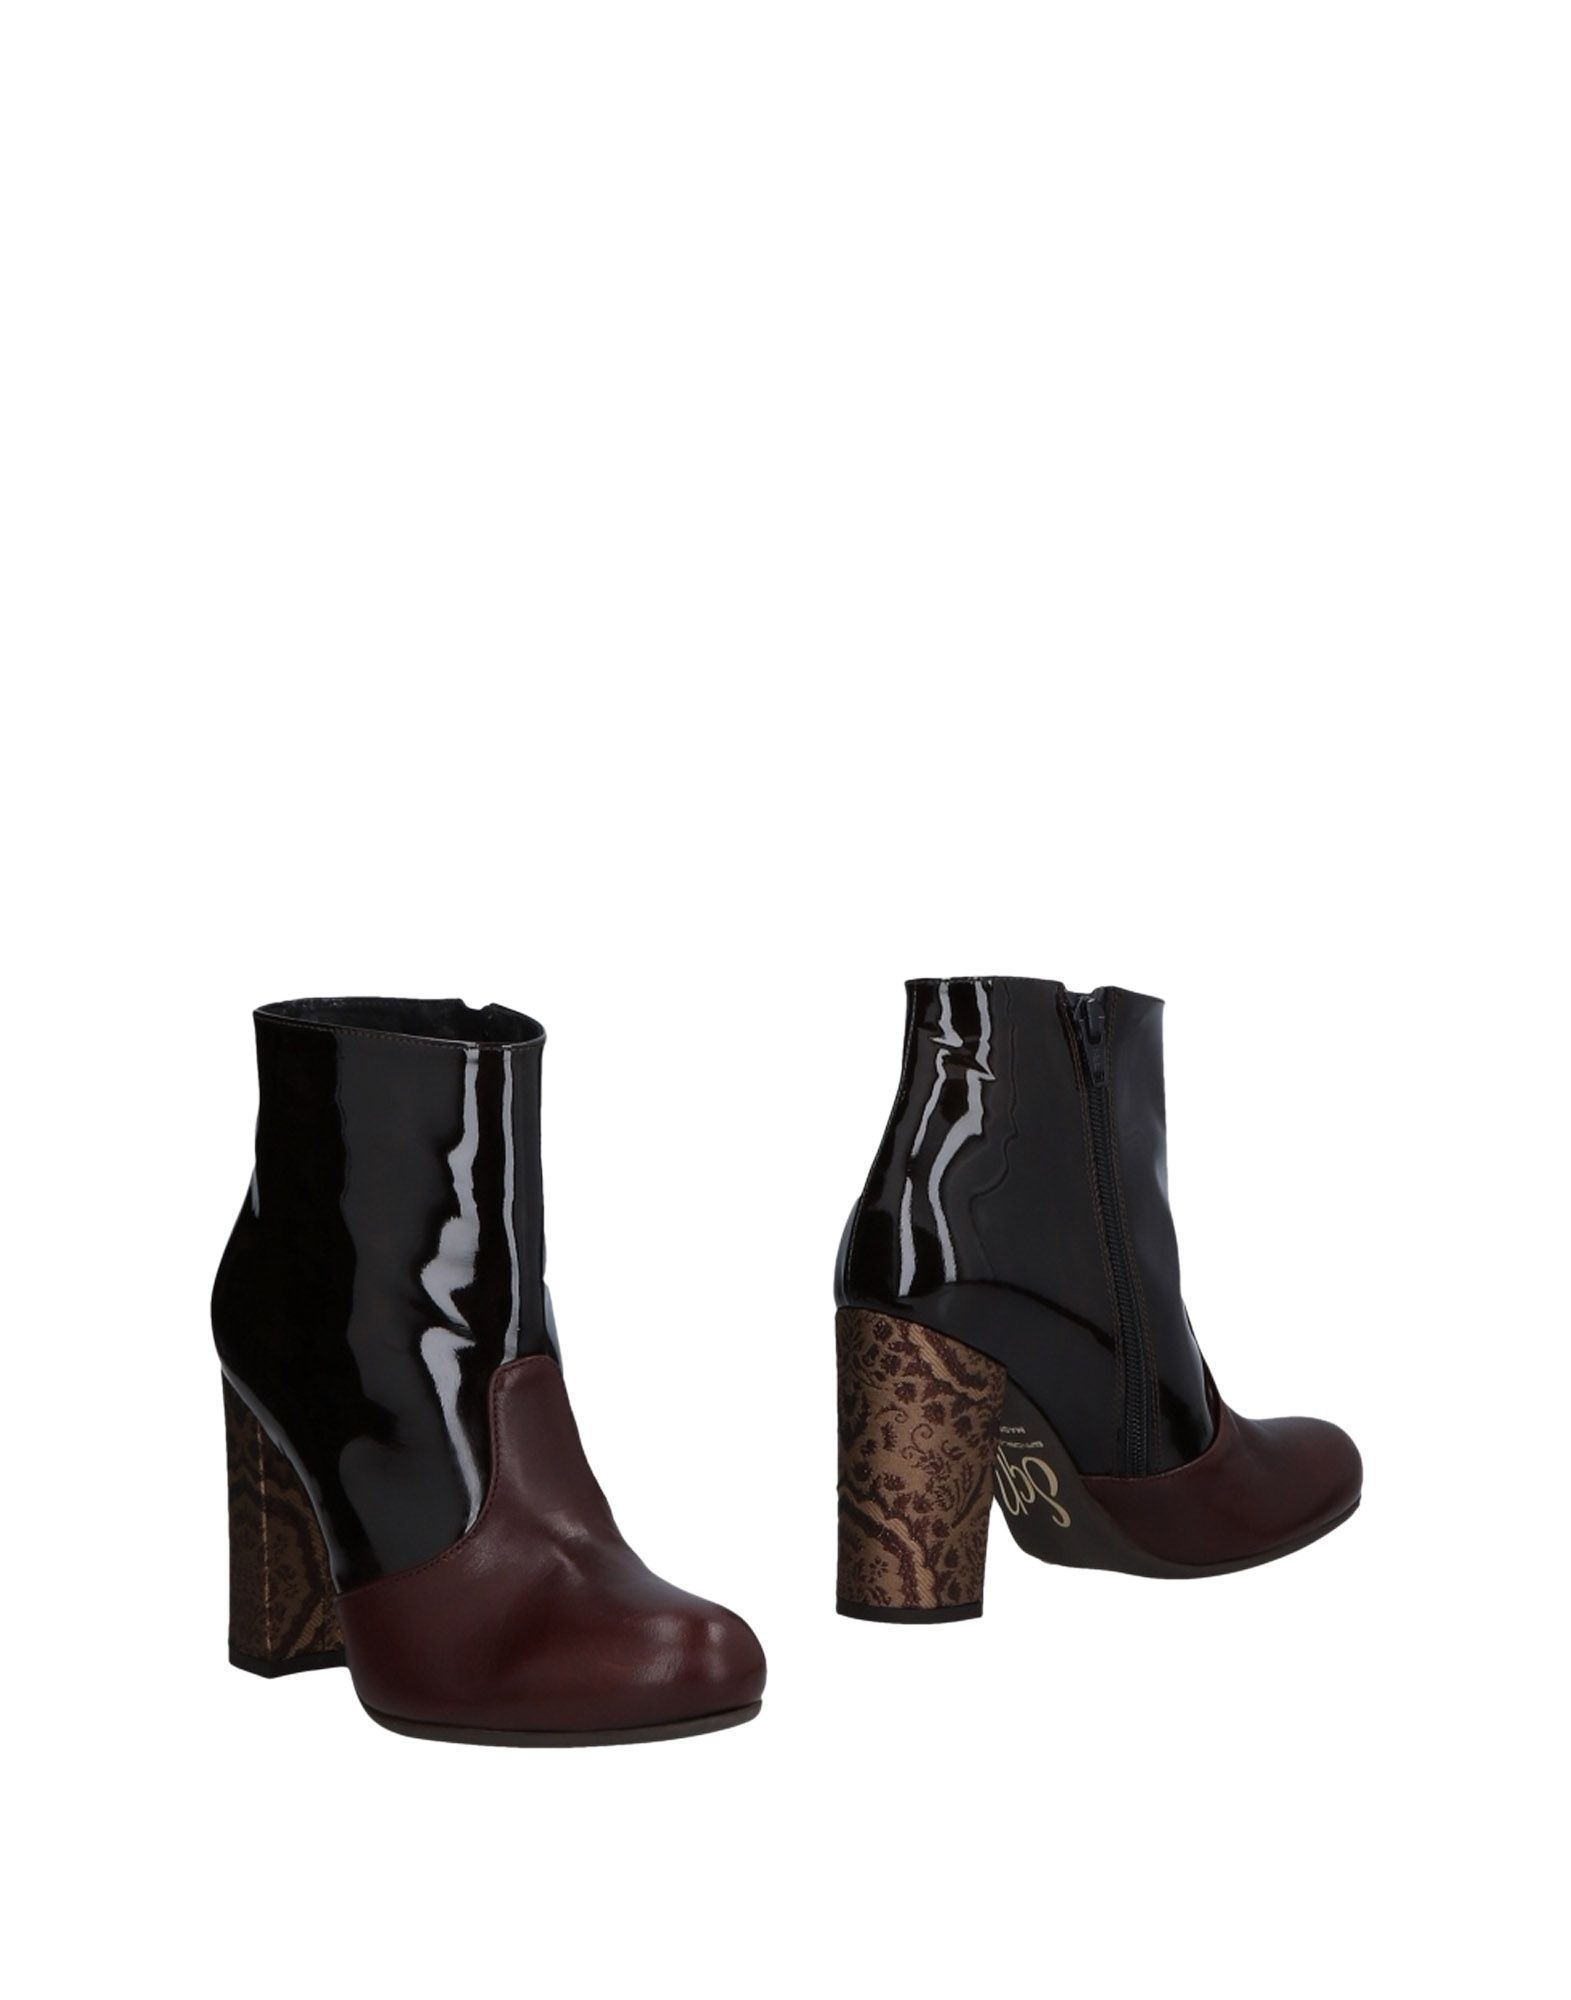 Sgn  Giancarlo Paoli Stiefelette Damen  Sgn 11475304UBGut aussehende strapazierfähige Schuhe 2383e7